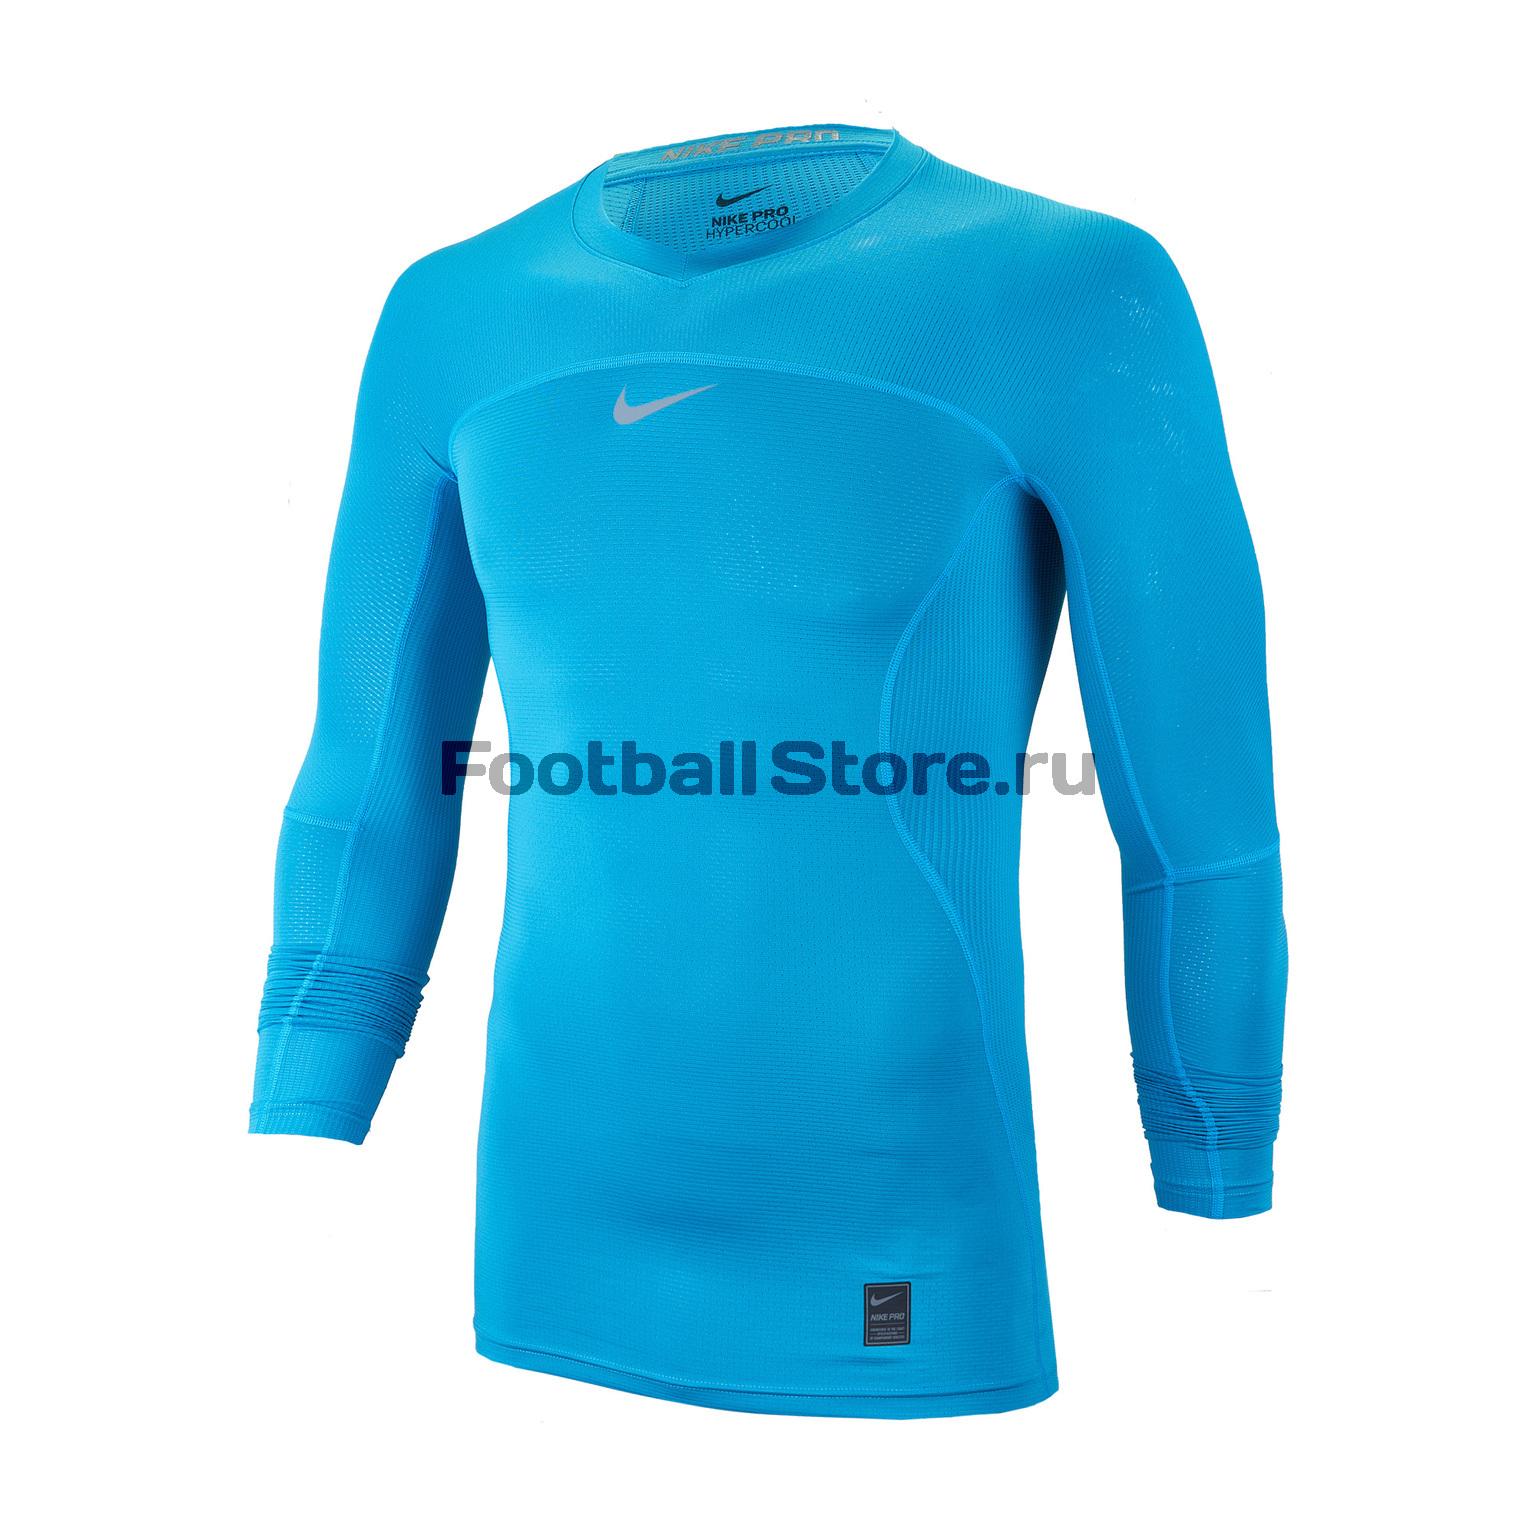 Белье футболка Nike GFA Hypercool Top Comp 880203-498